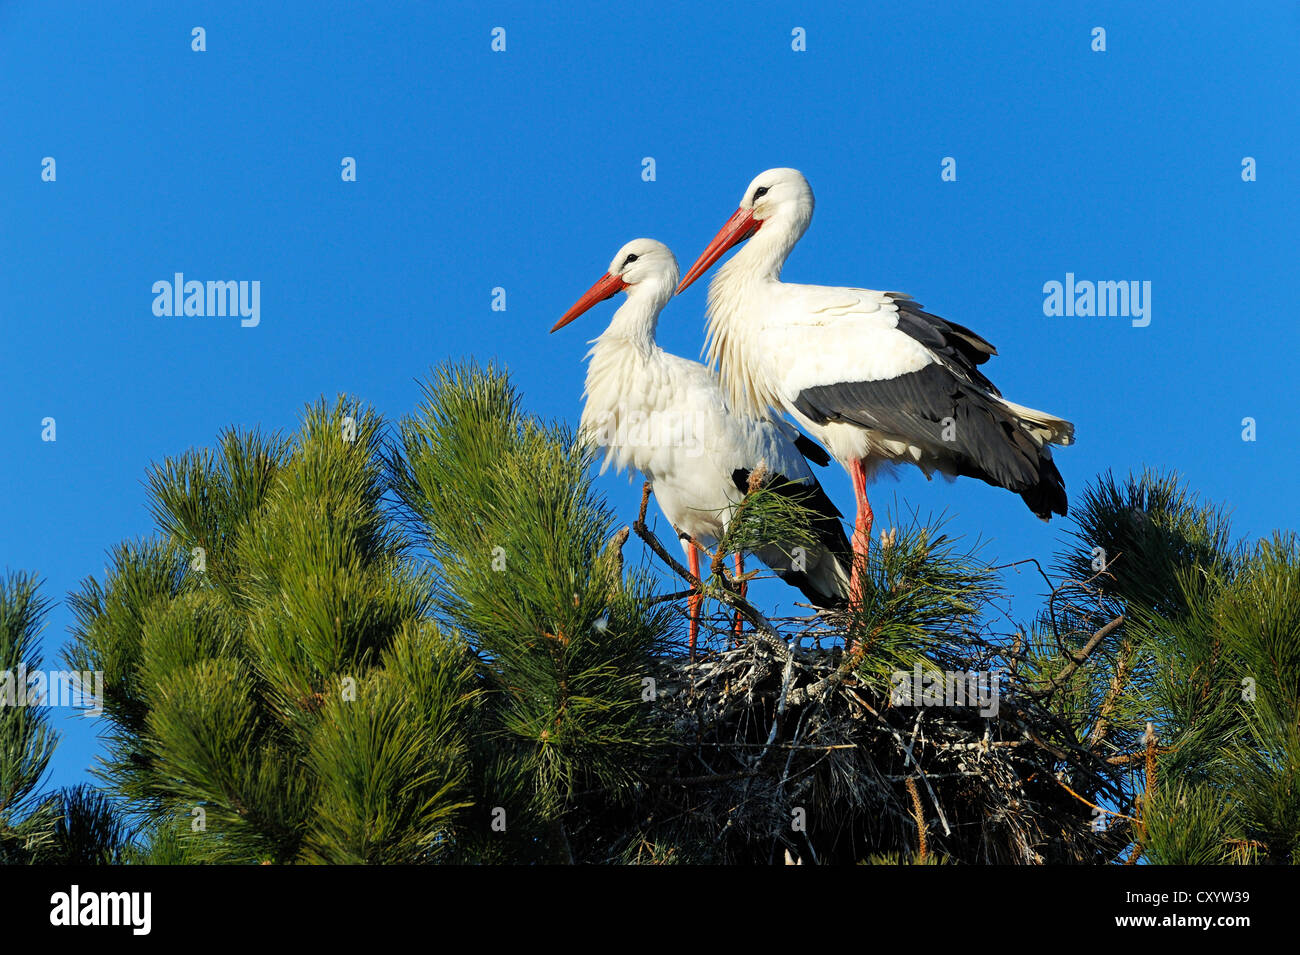 White Storks (Ciconia ciconia) sitting on a nest, Muri, Switzerland, Europe - Stock Image